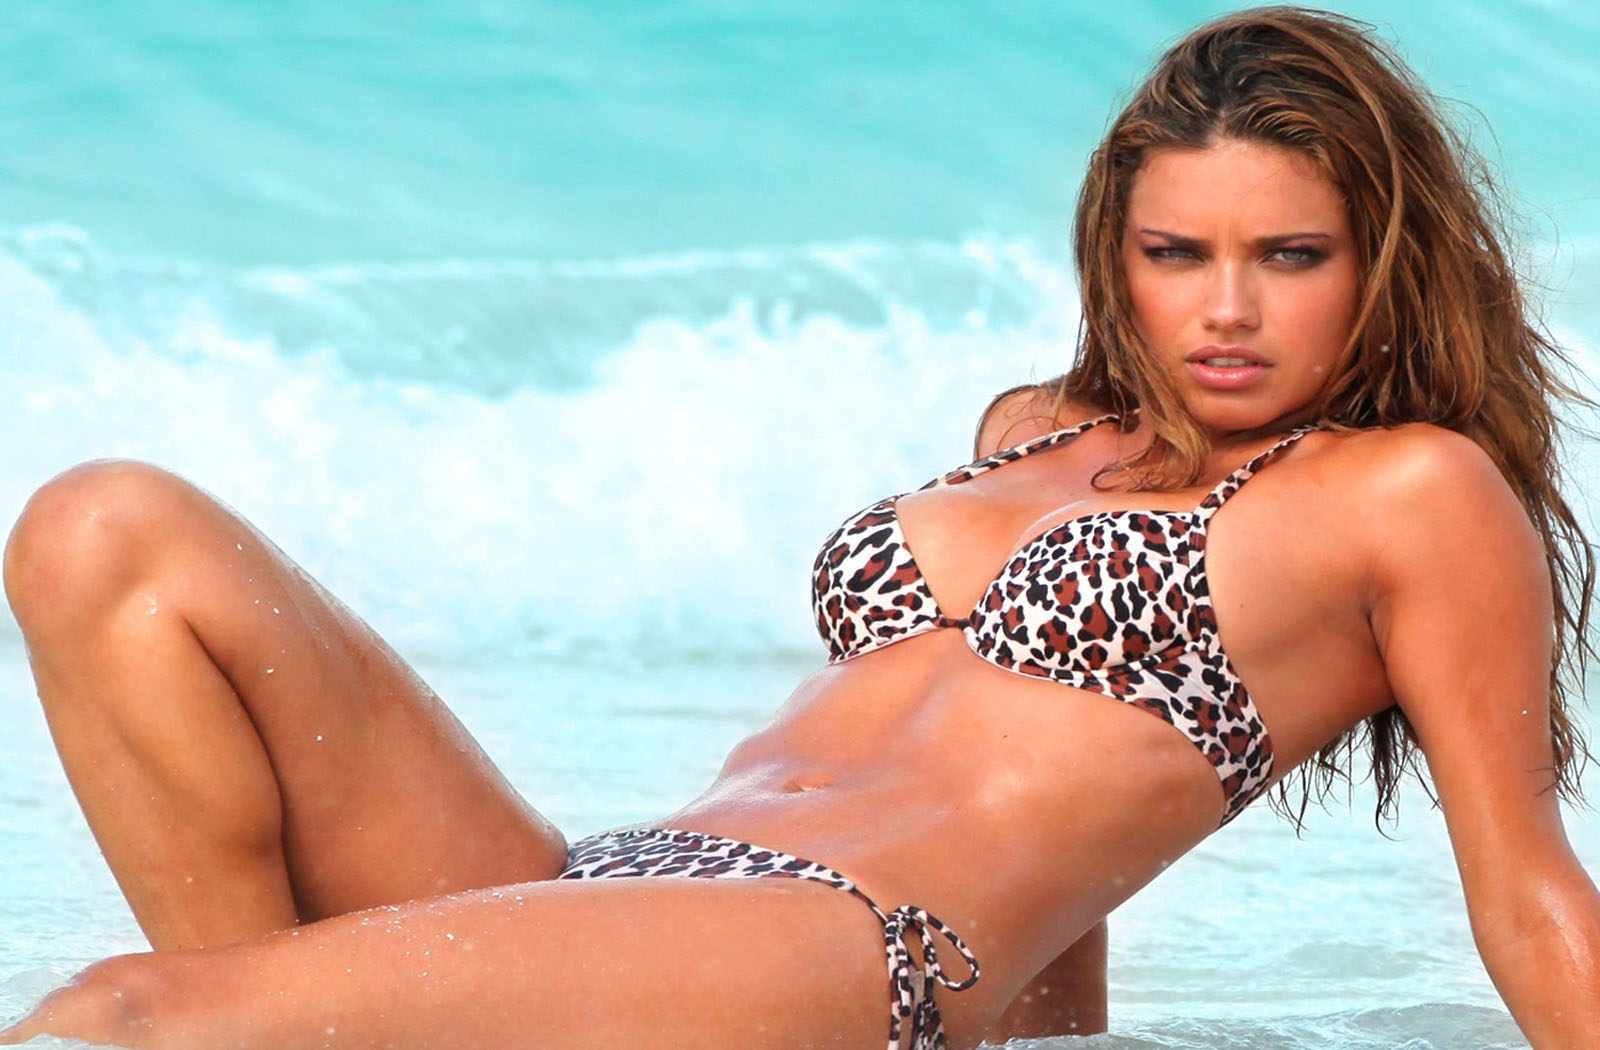 Adriana lima 2012 victoria039s secret beach bombshell advert 9